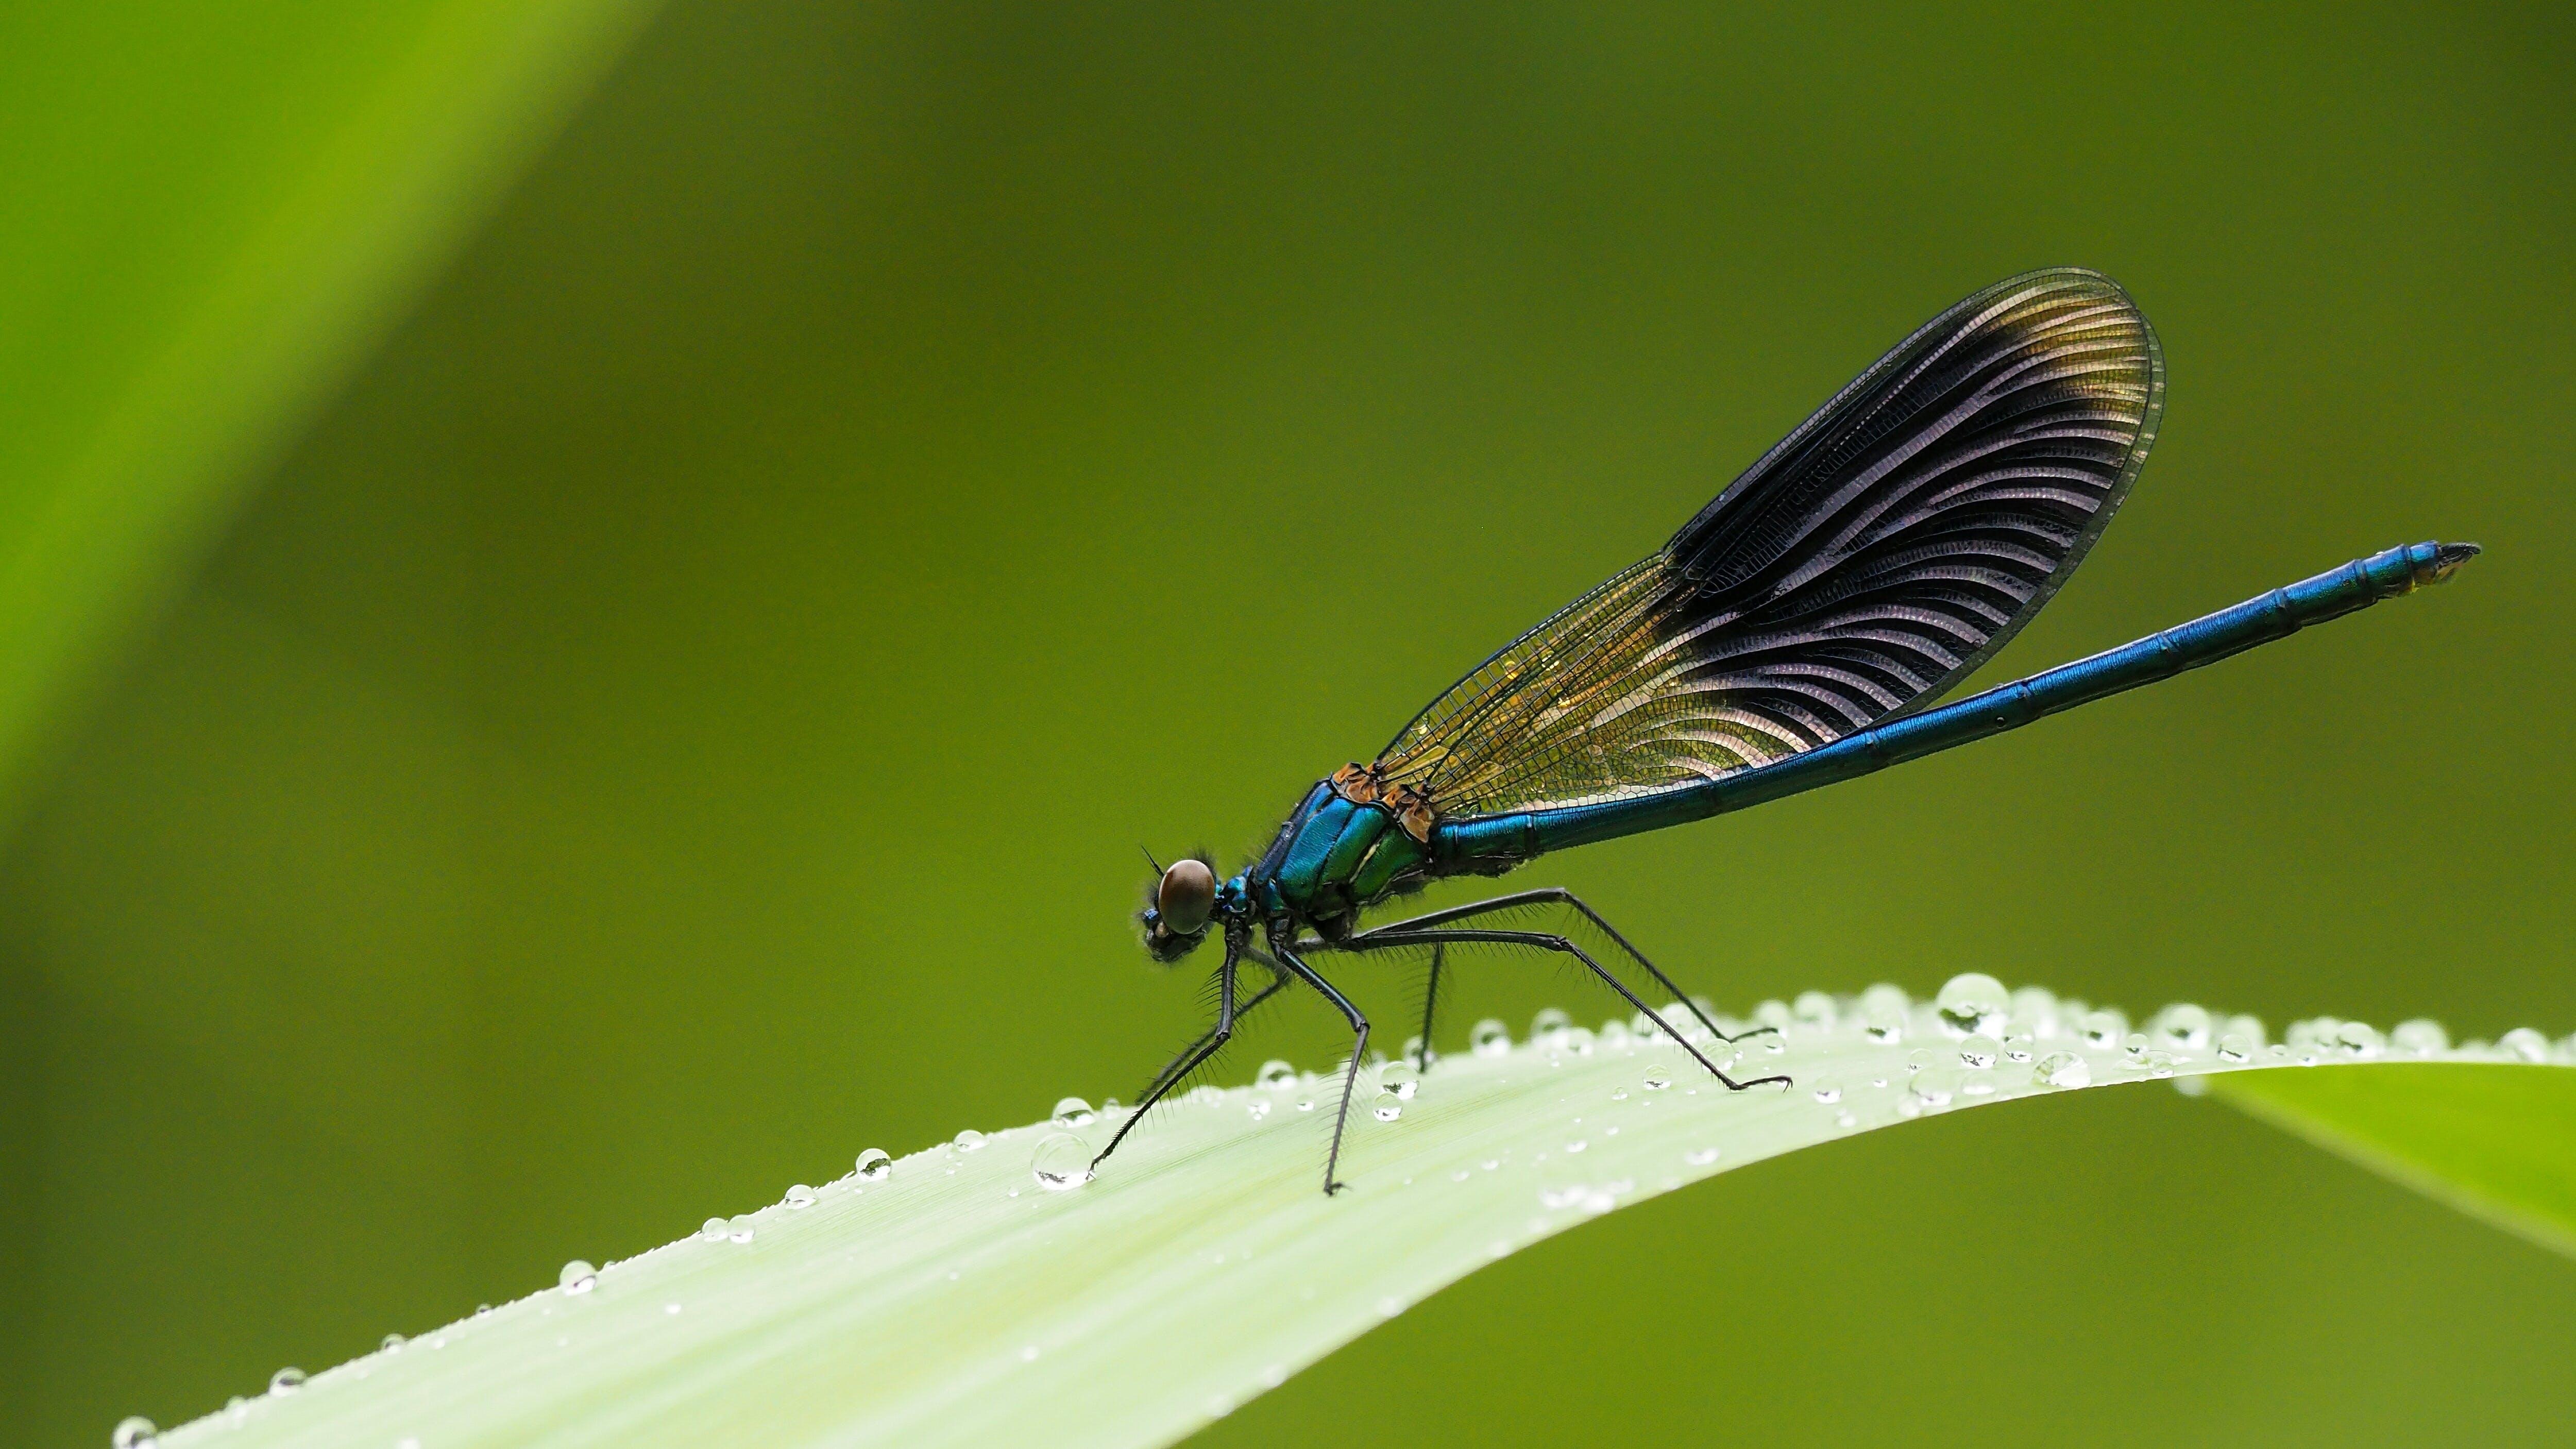 Kostenloses Stock Foto zu biologie, blau, damselfly, entomologie